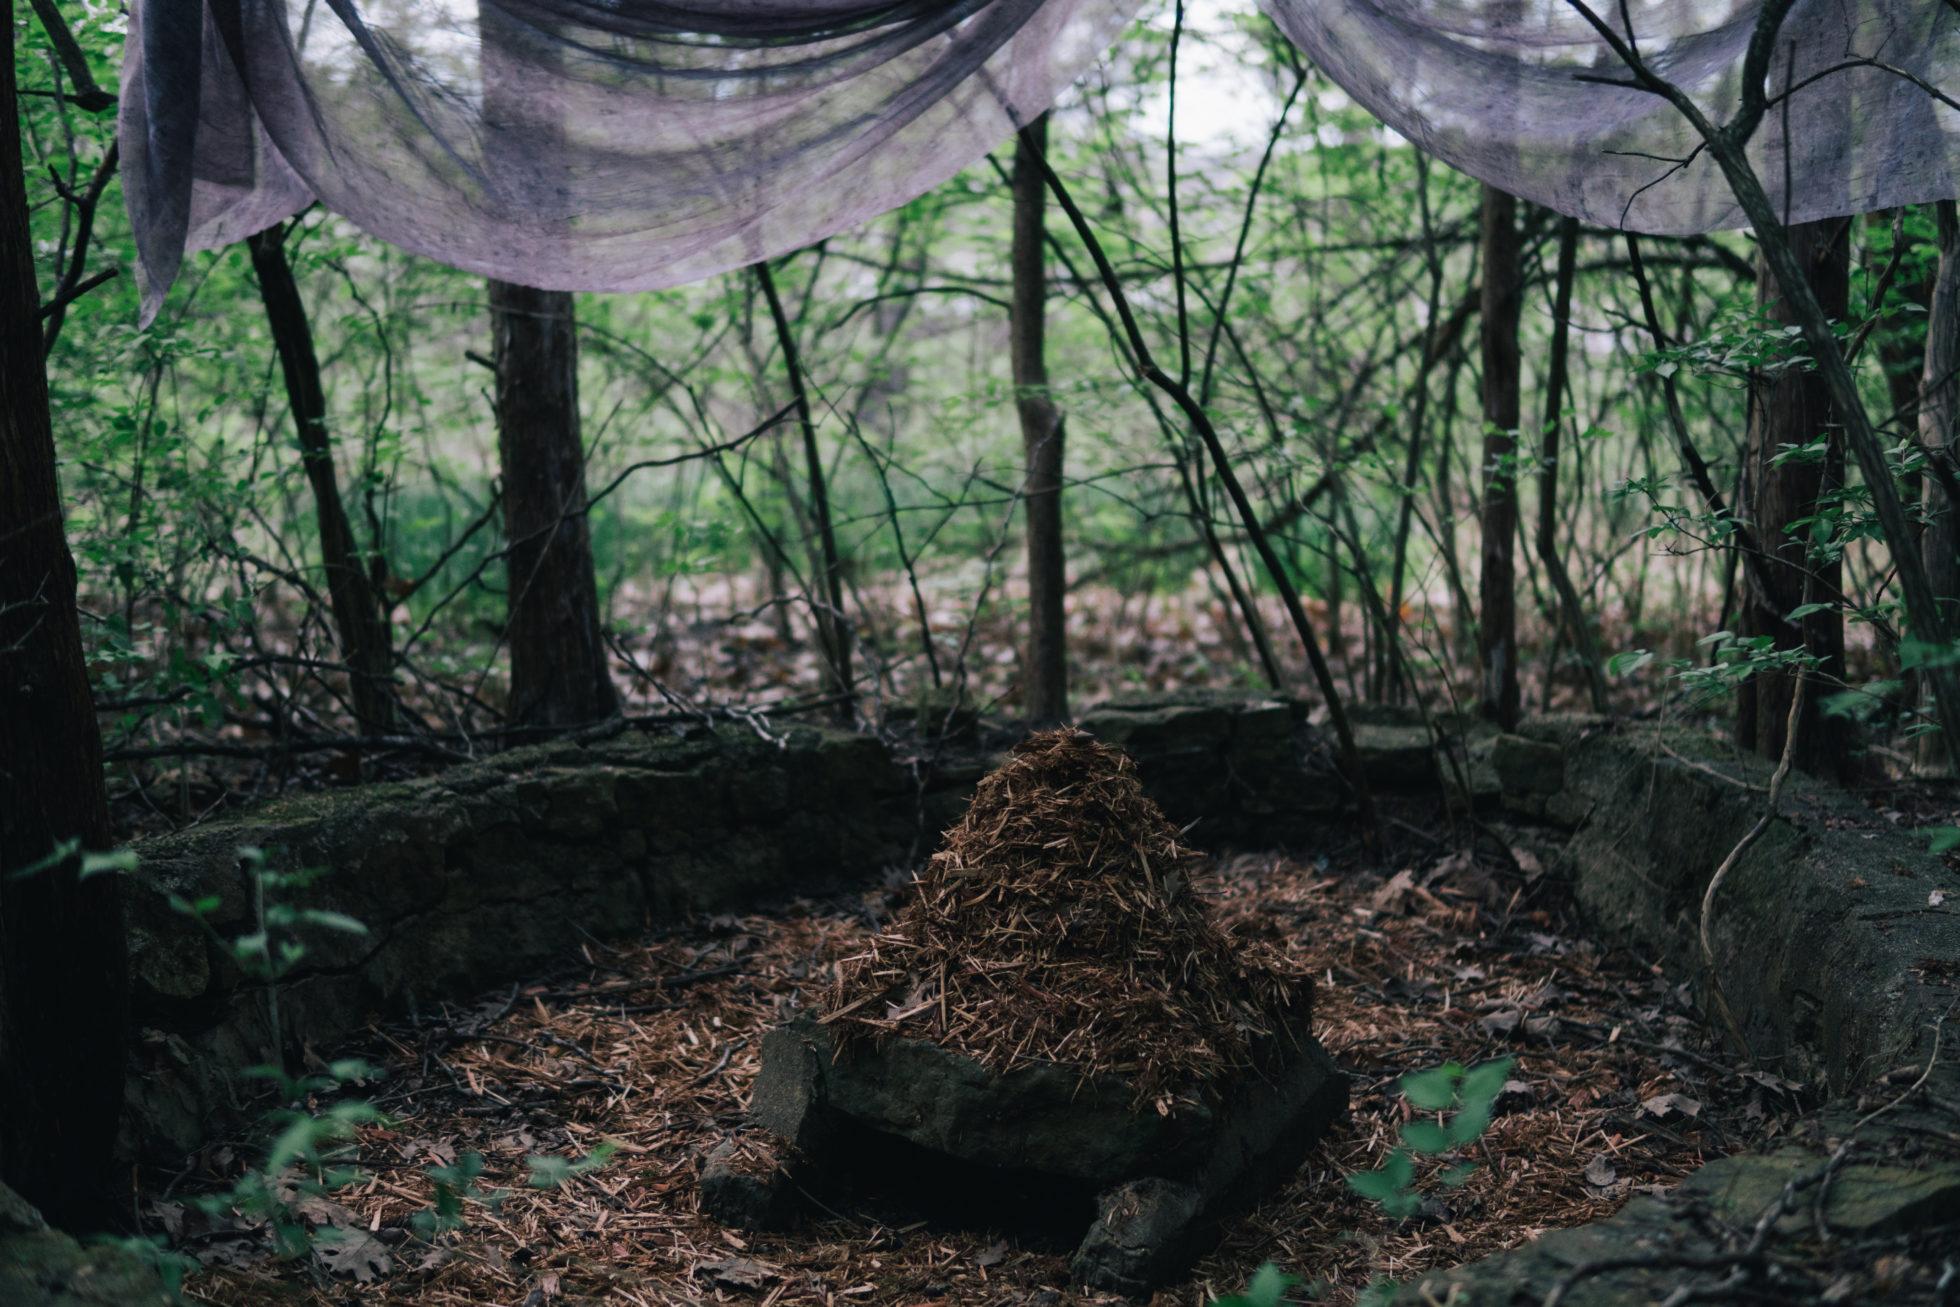 Dreaming Under a Cedar Tree_photo by Sophia-Odelia Bauer 2017